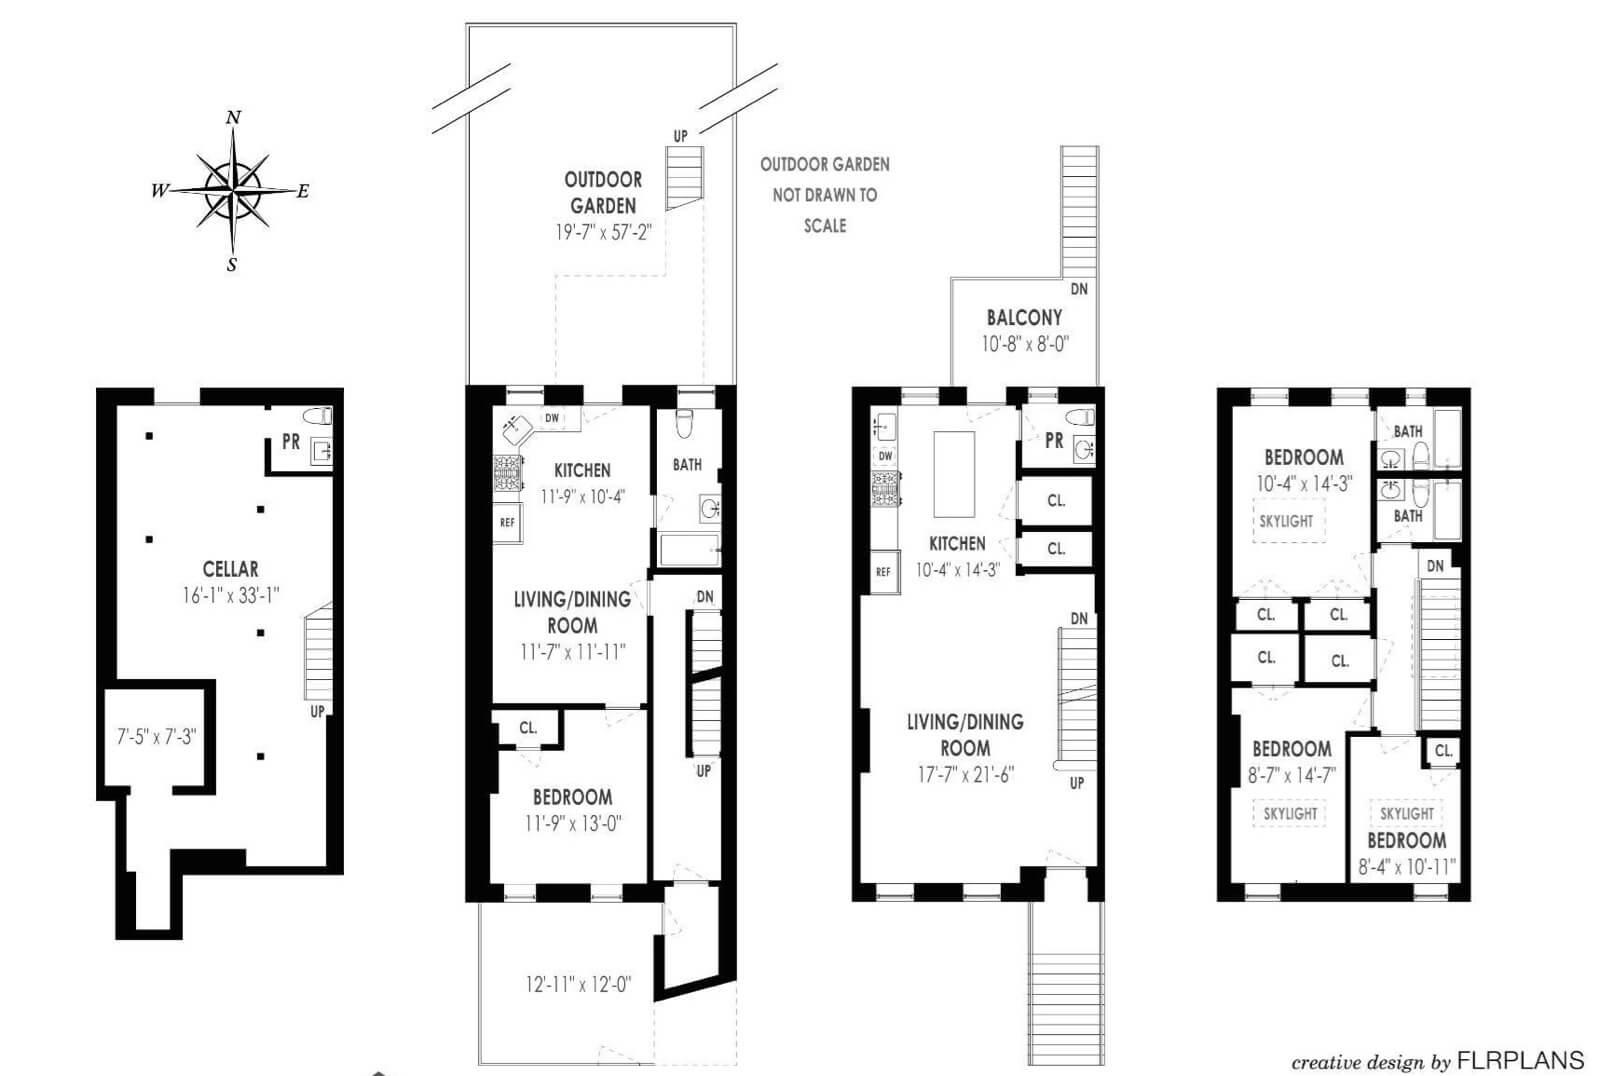 garden-apartment-nyc-brooklyn-549-monroe-street - 1